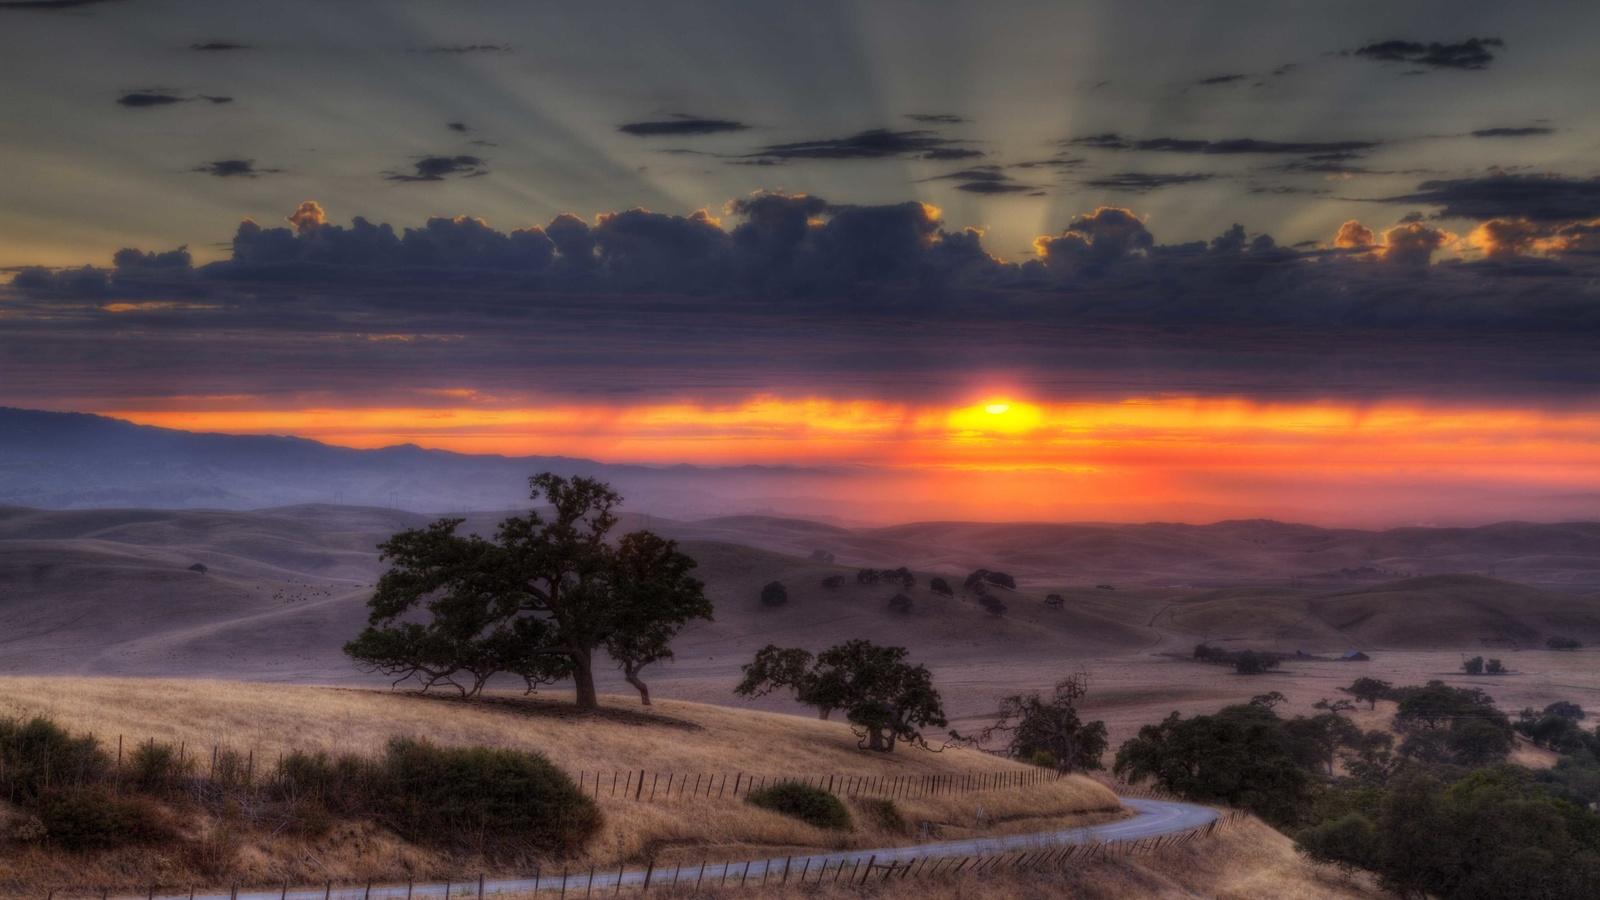 горизонт, облака, забор, долина